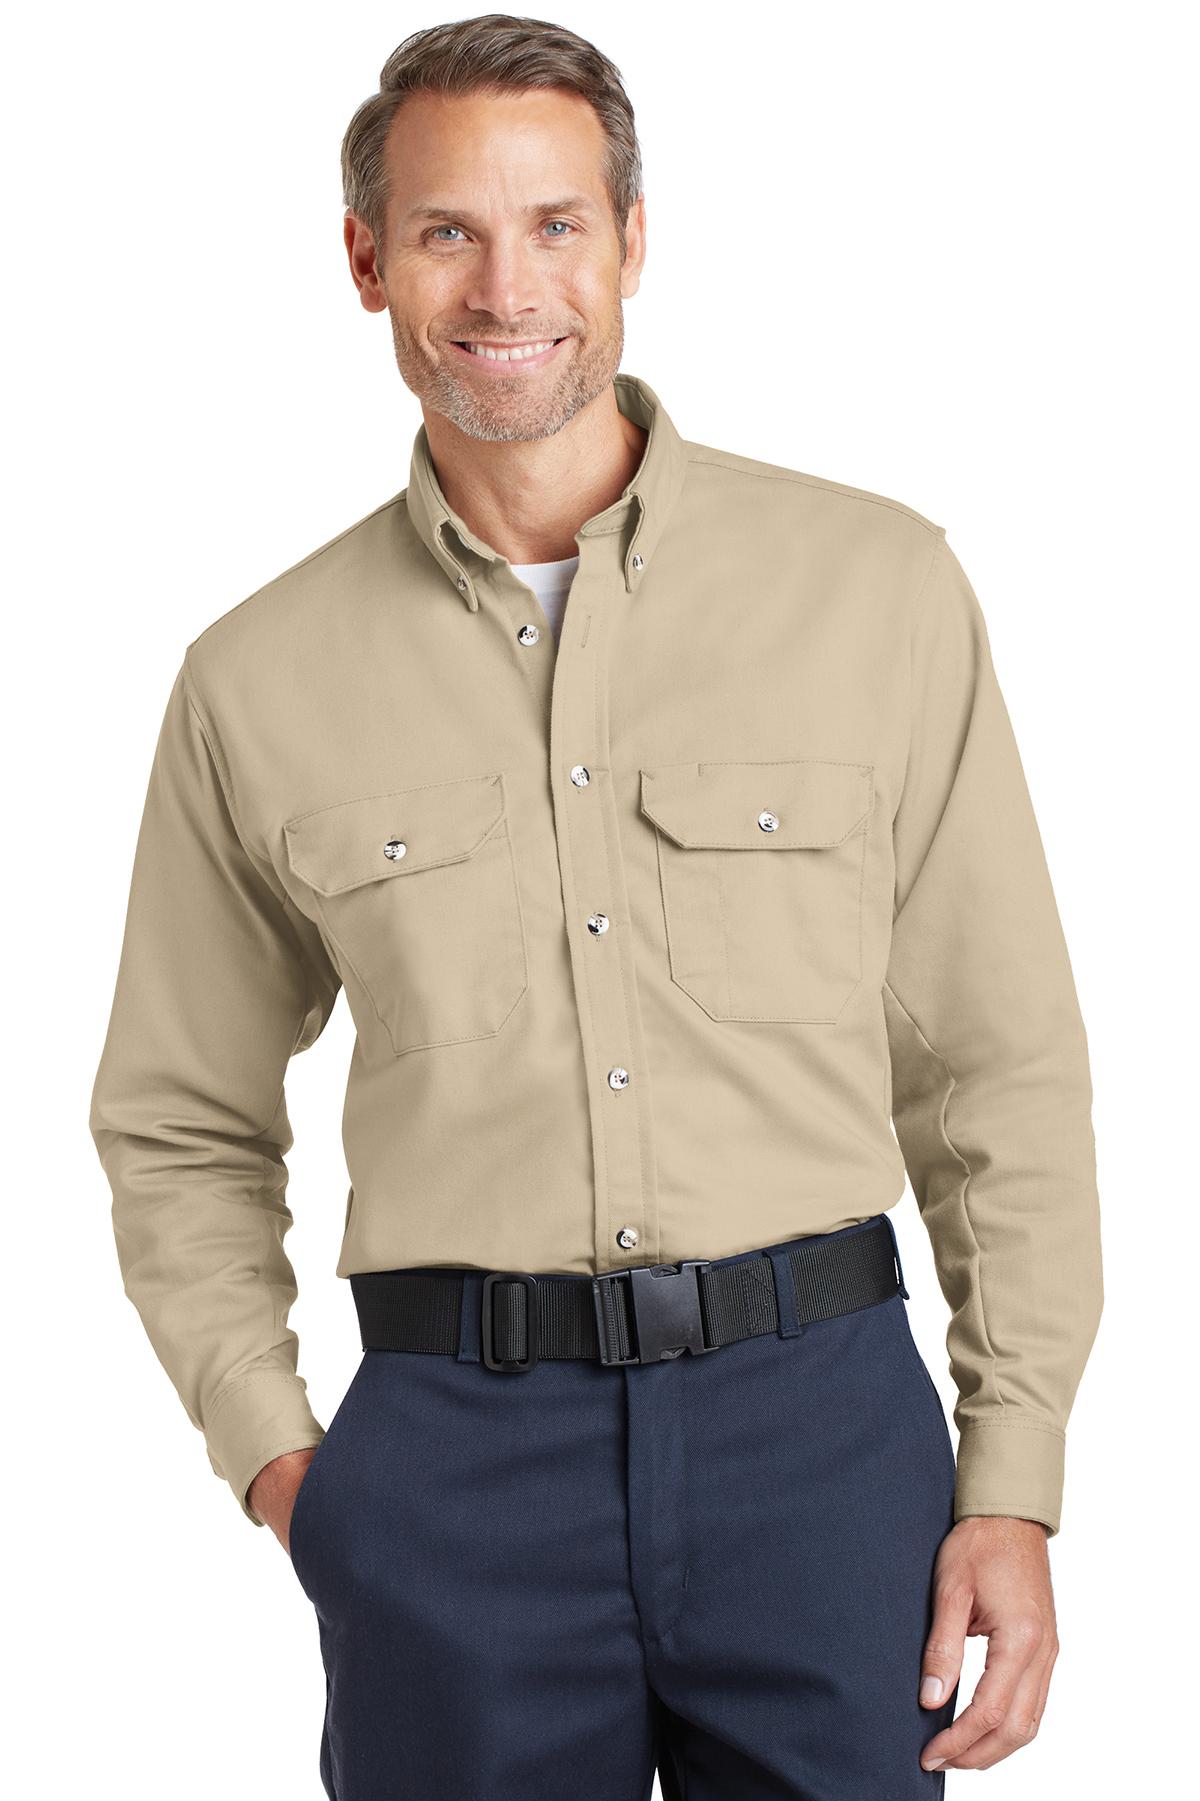 ca0e6b9694e Bulwark® EXCEL FR® ComforTouch® Dress Uniform Shirt